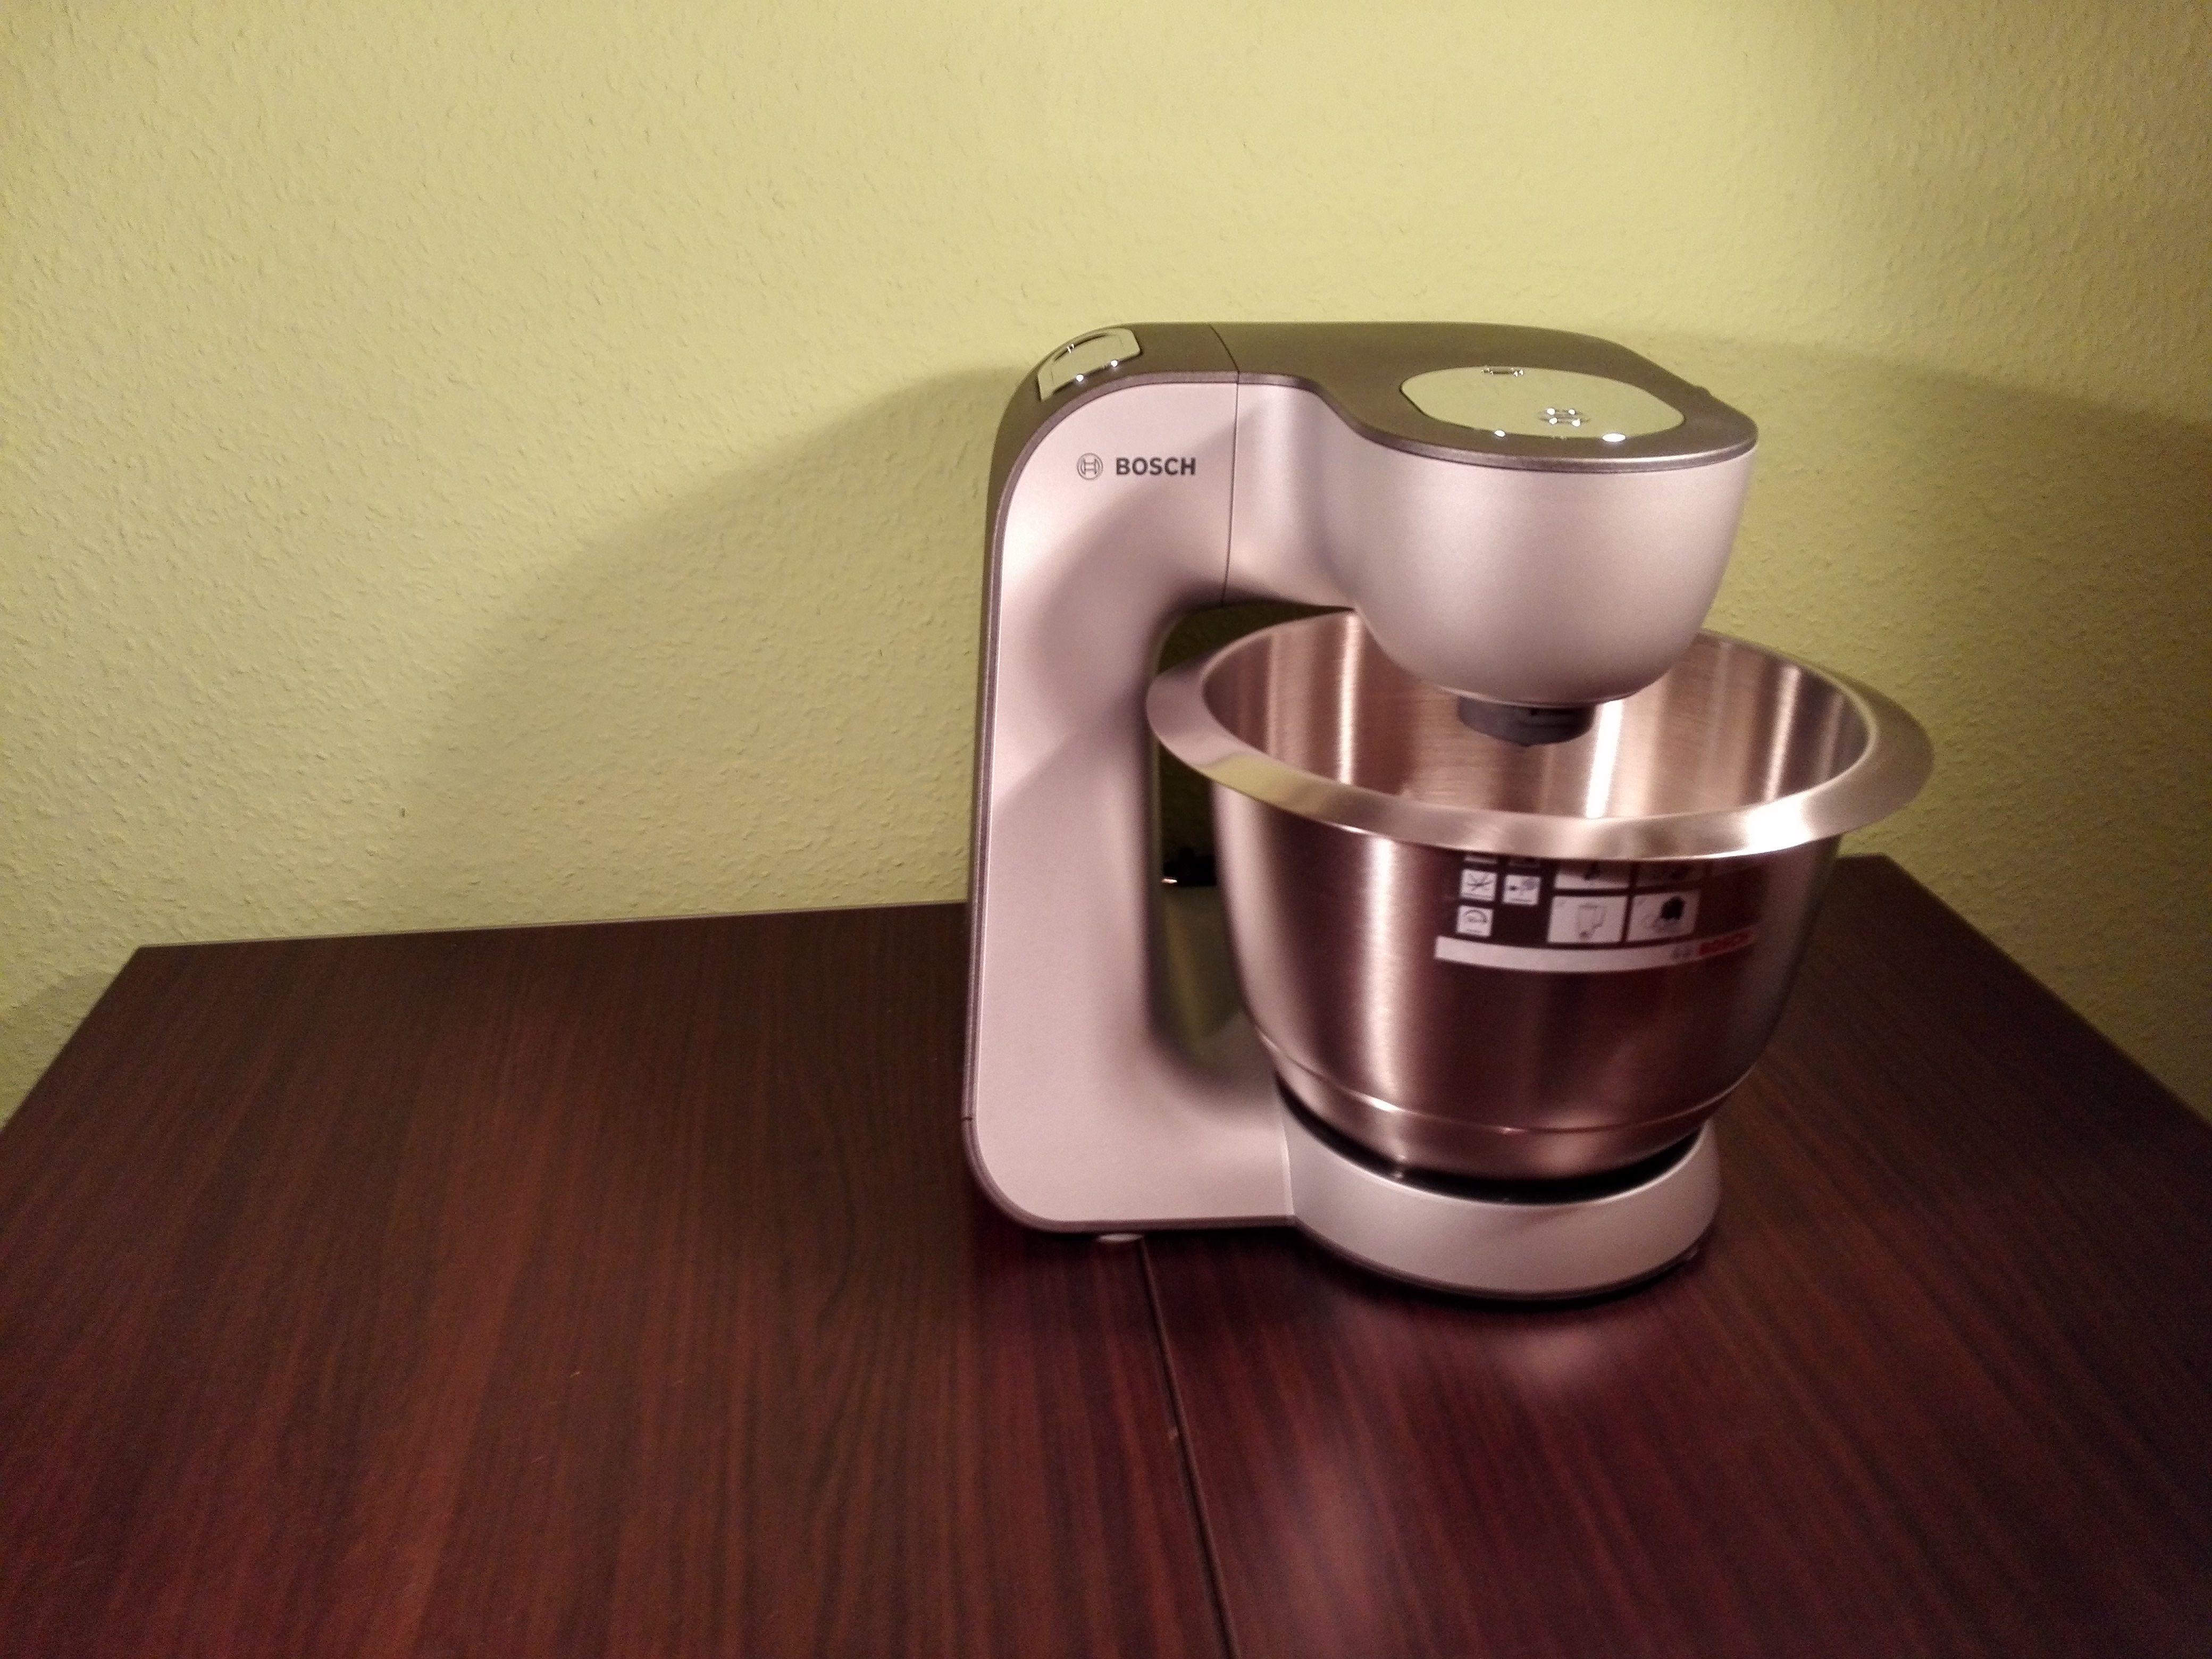 Bosch mum56s40 küchenmaschine styline mum5  17 beste ideer om Bosch Mum56340 på Pinterest